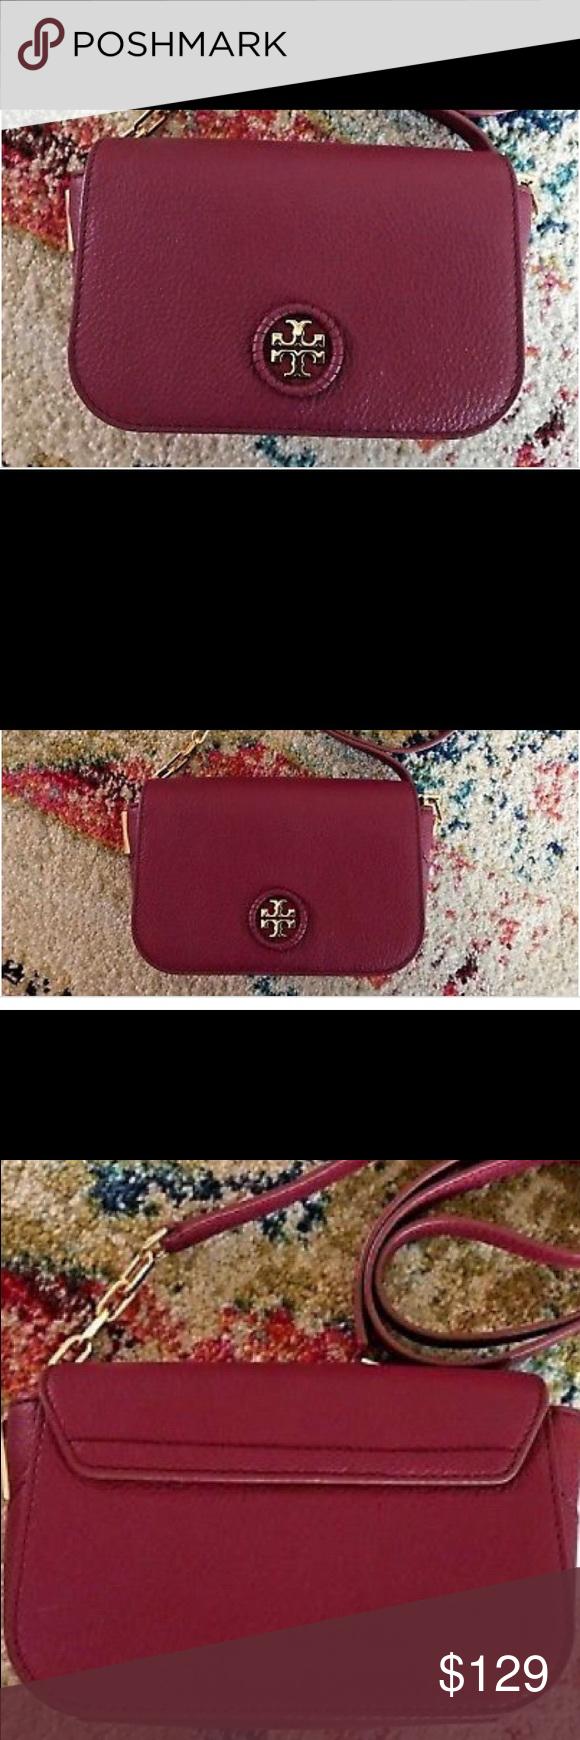 "416c8561104 TORY BURCH Whipstitch Logo Mini Crossbody Bag NWOT Red Agate crossbody 7"" pebbled  leather bag"